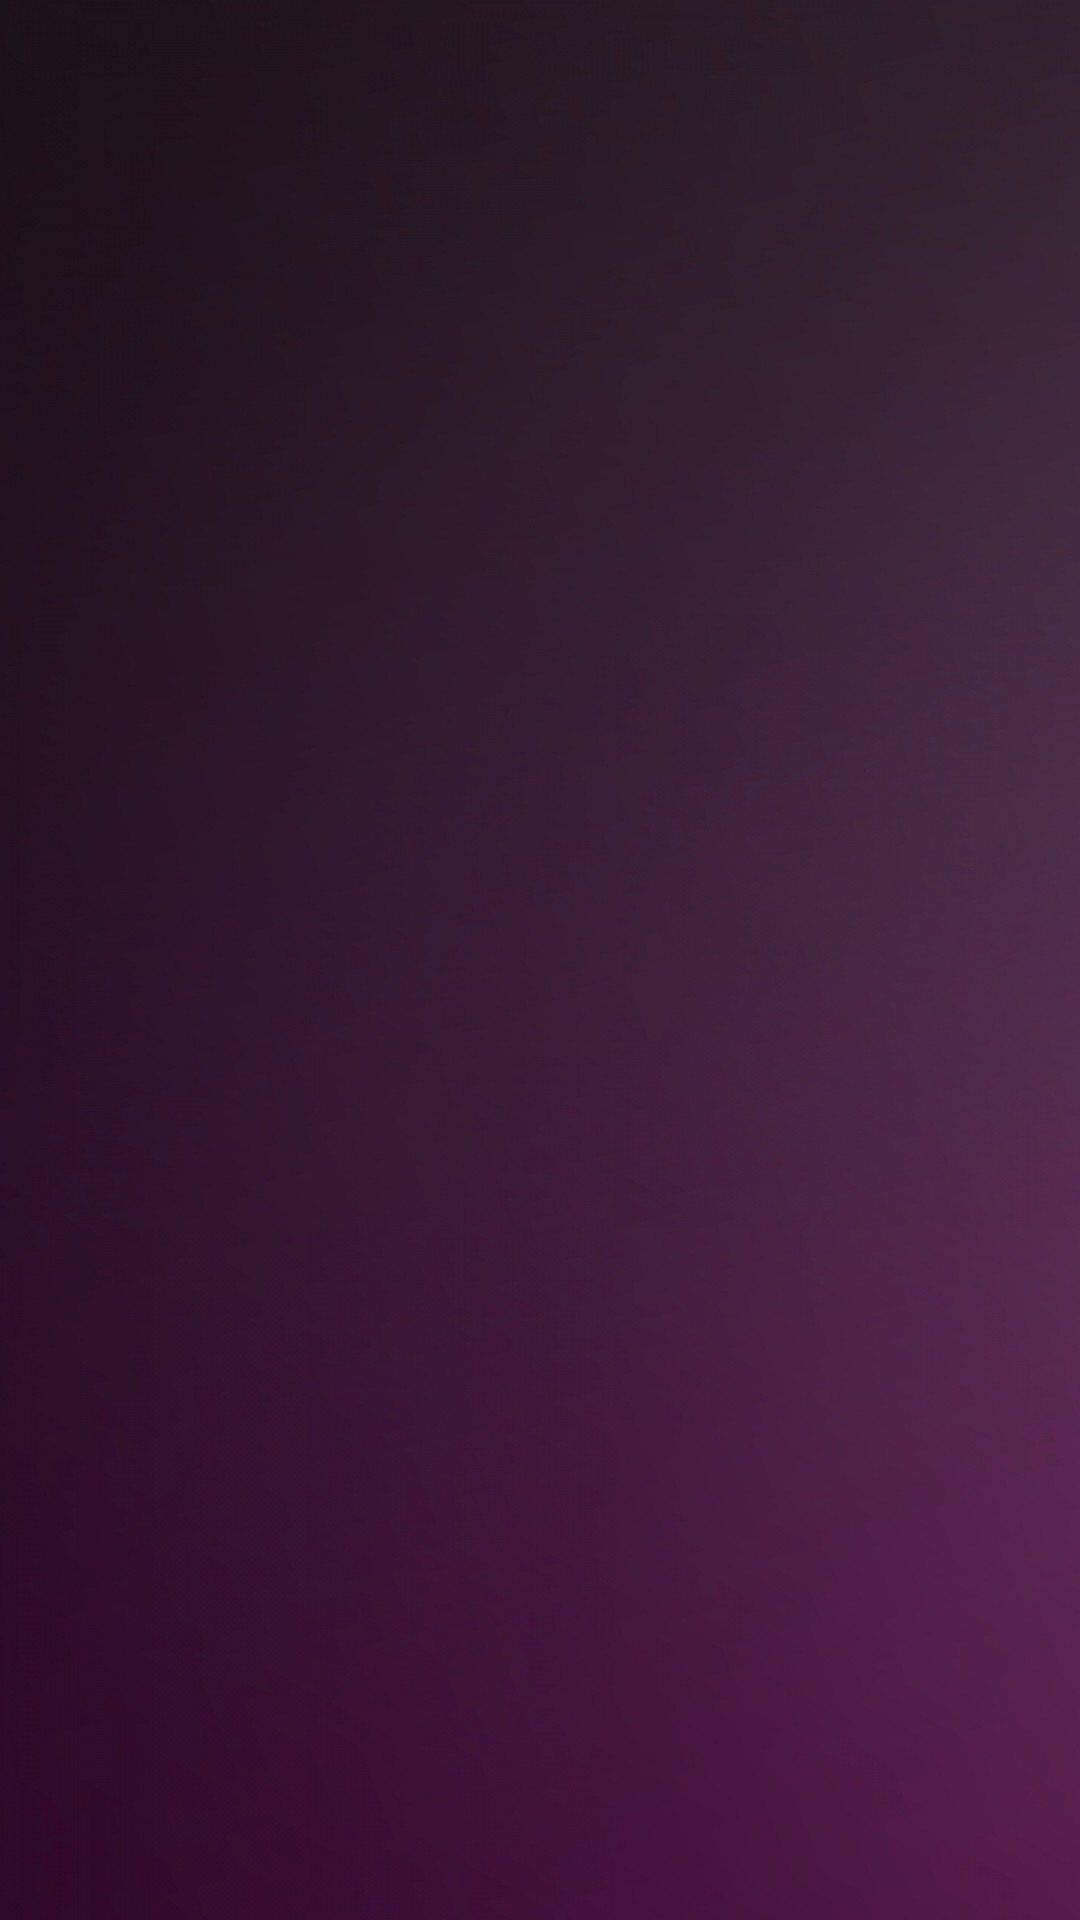 Preview Wallpaper Purple, Dark, Shadow, Color   Data-src - Dark Purple Background Iphone - HD Wallpaper